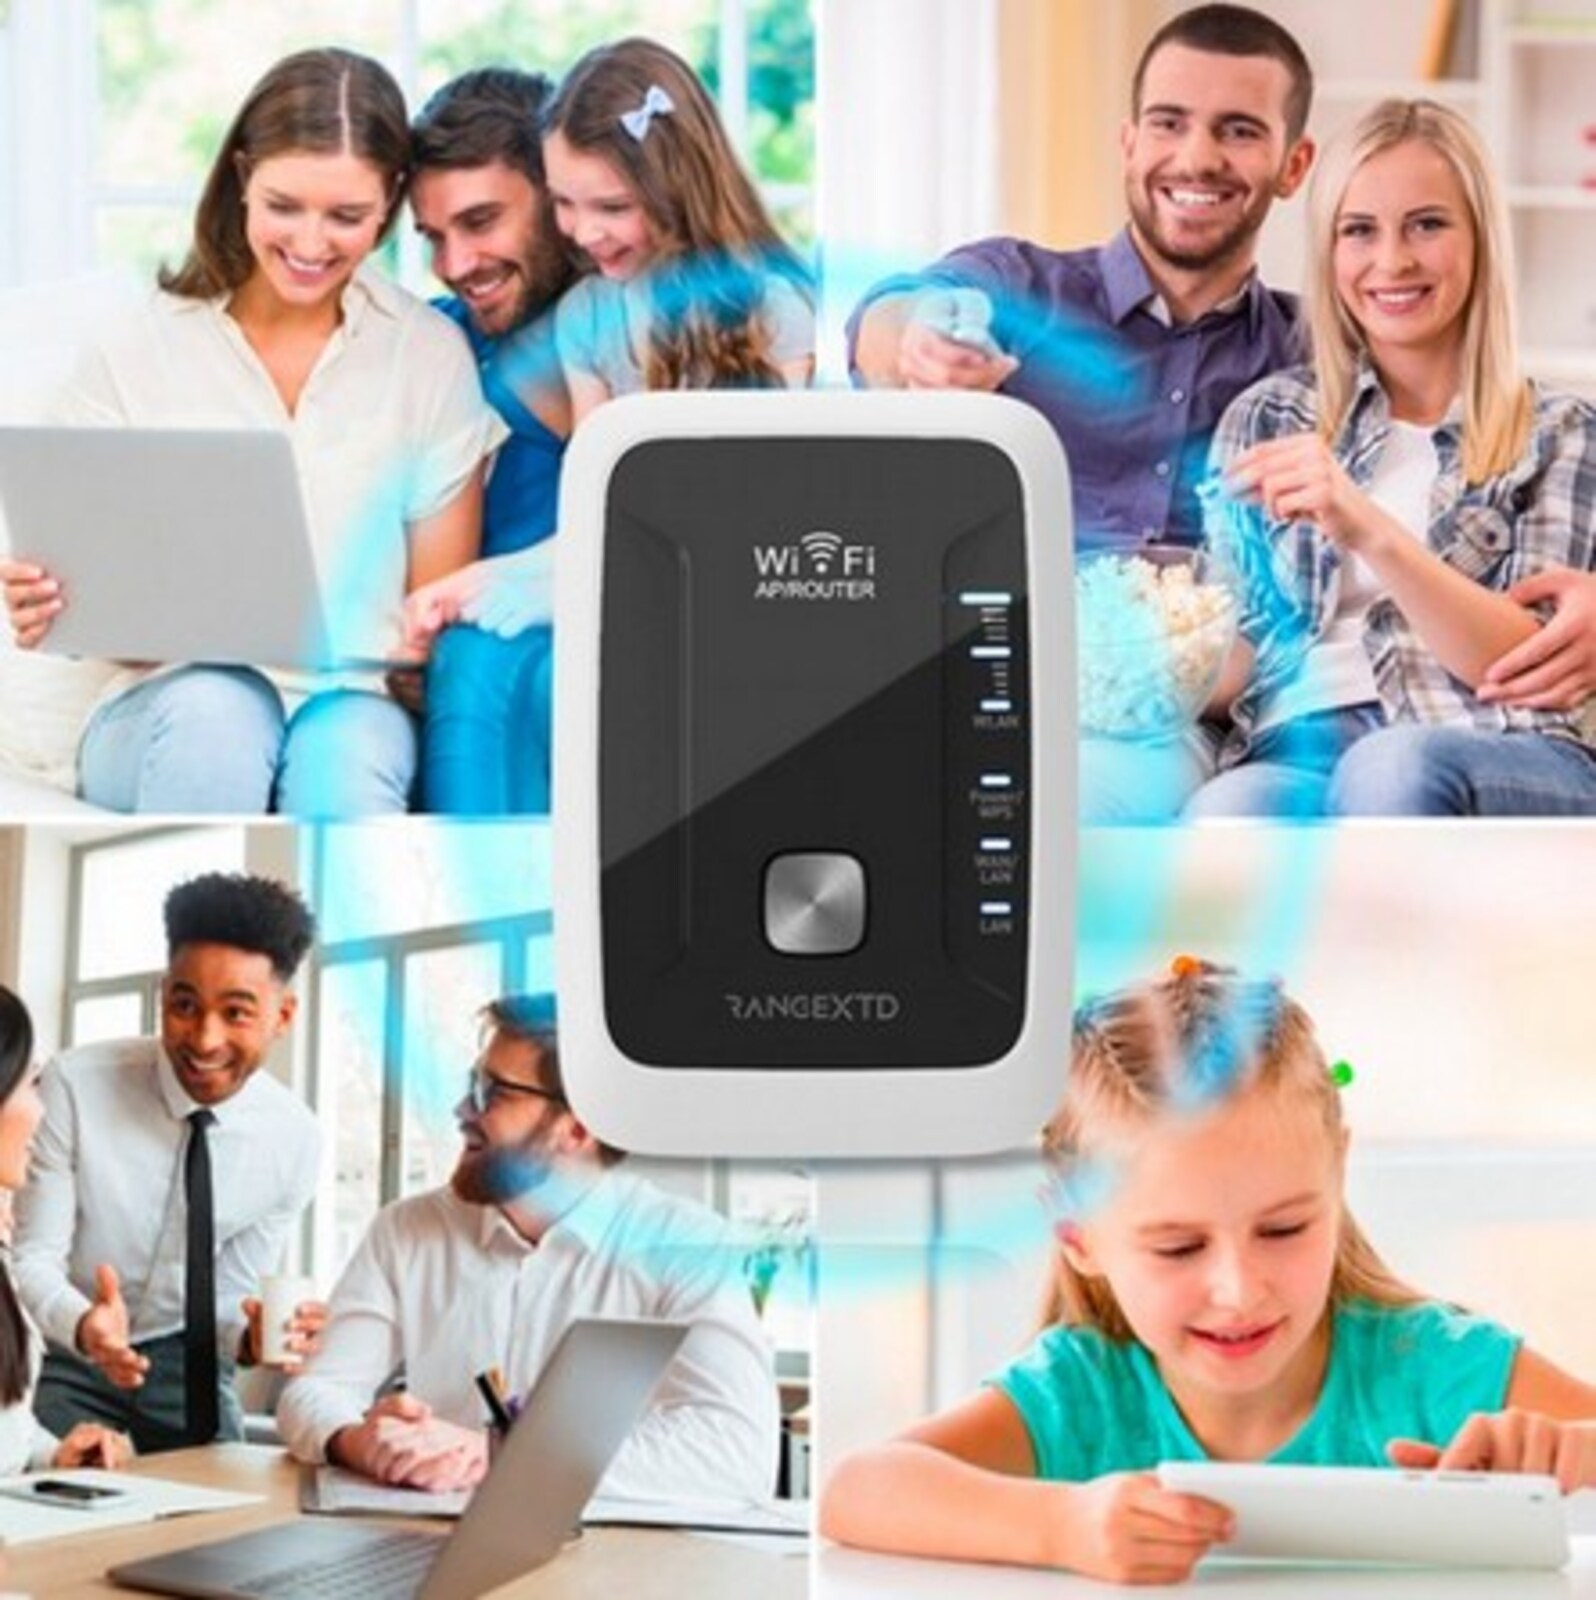 RangeXTD Wifi Booster